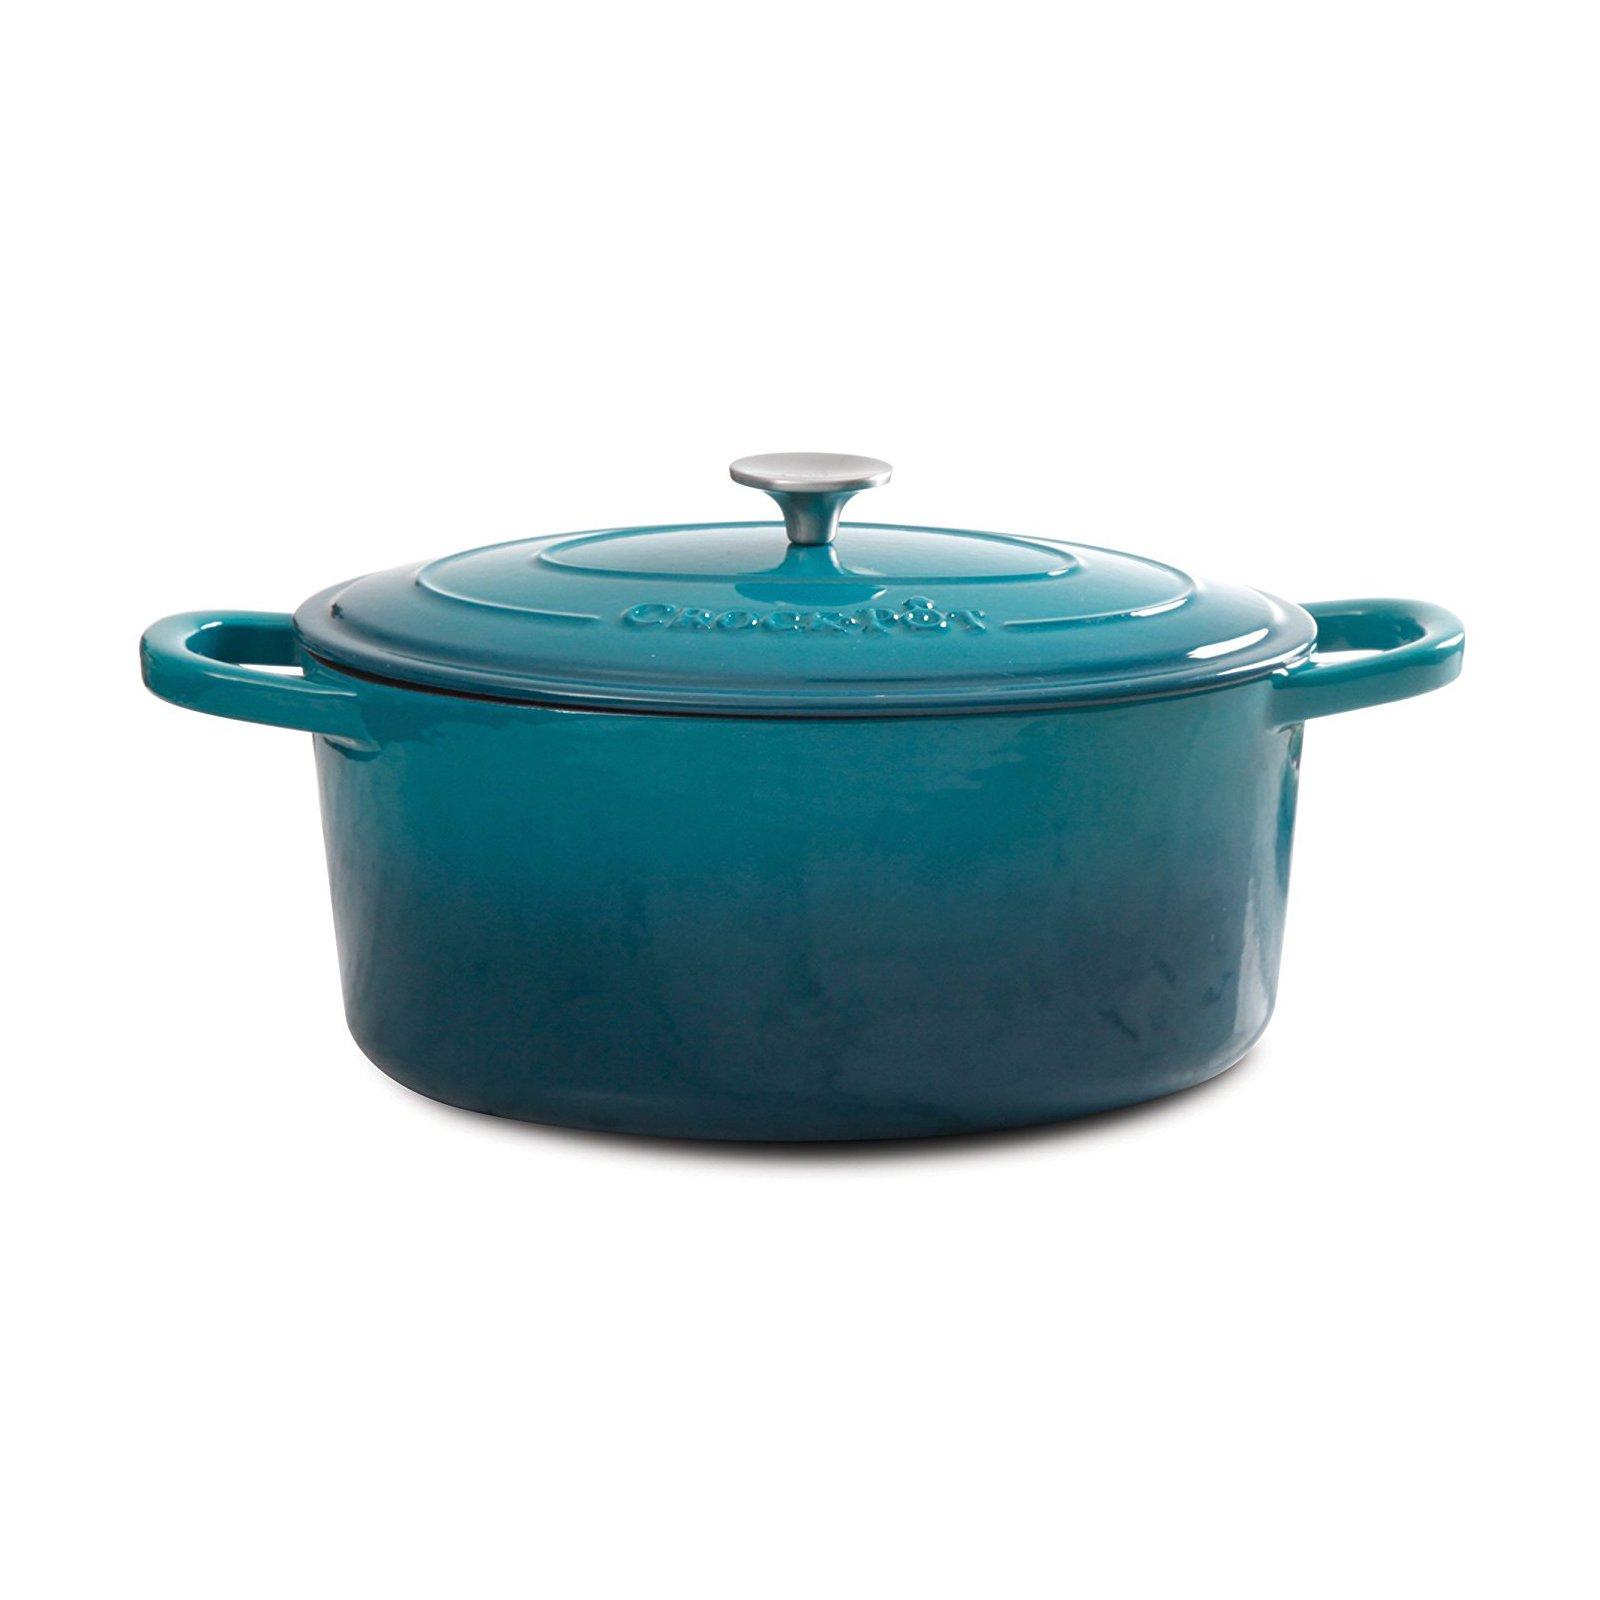 Crock Pot Artisan Enameled Cast Iron 5-Quart Round Dutch Oven, Teal Ombre